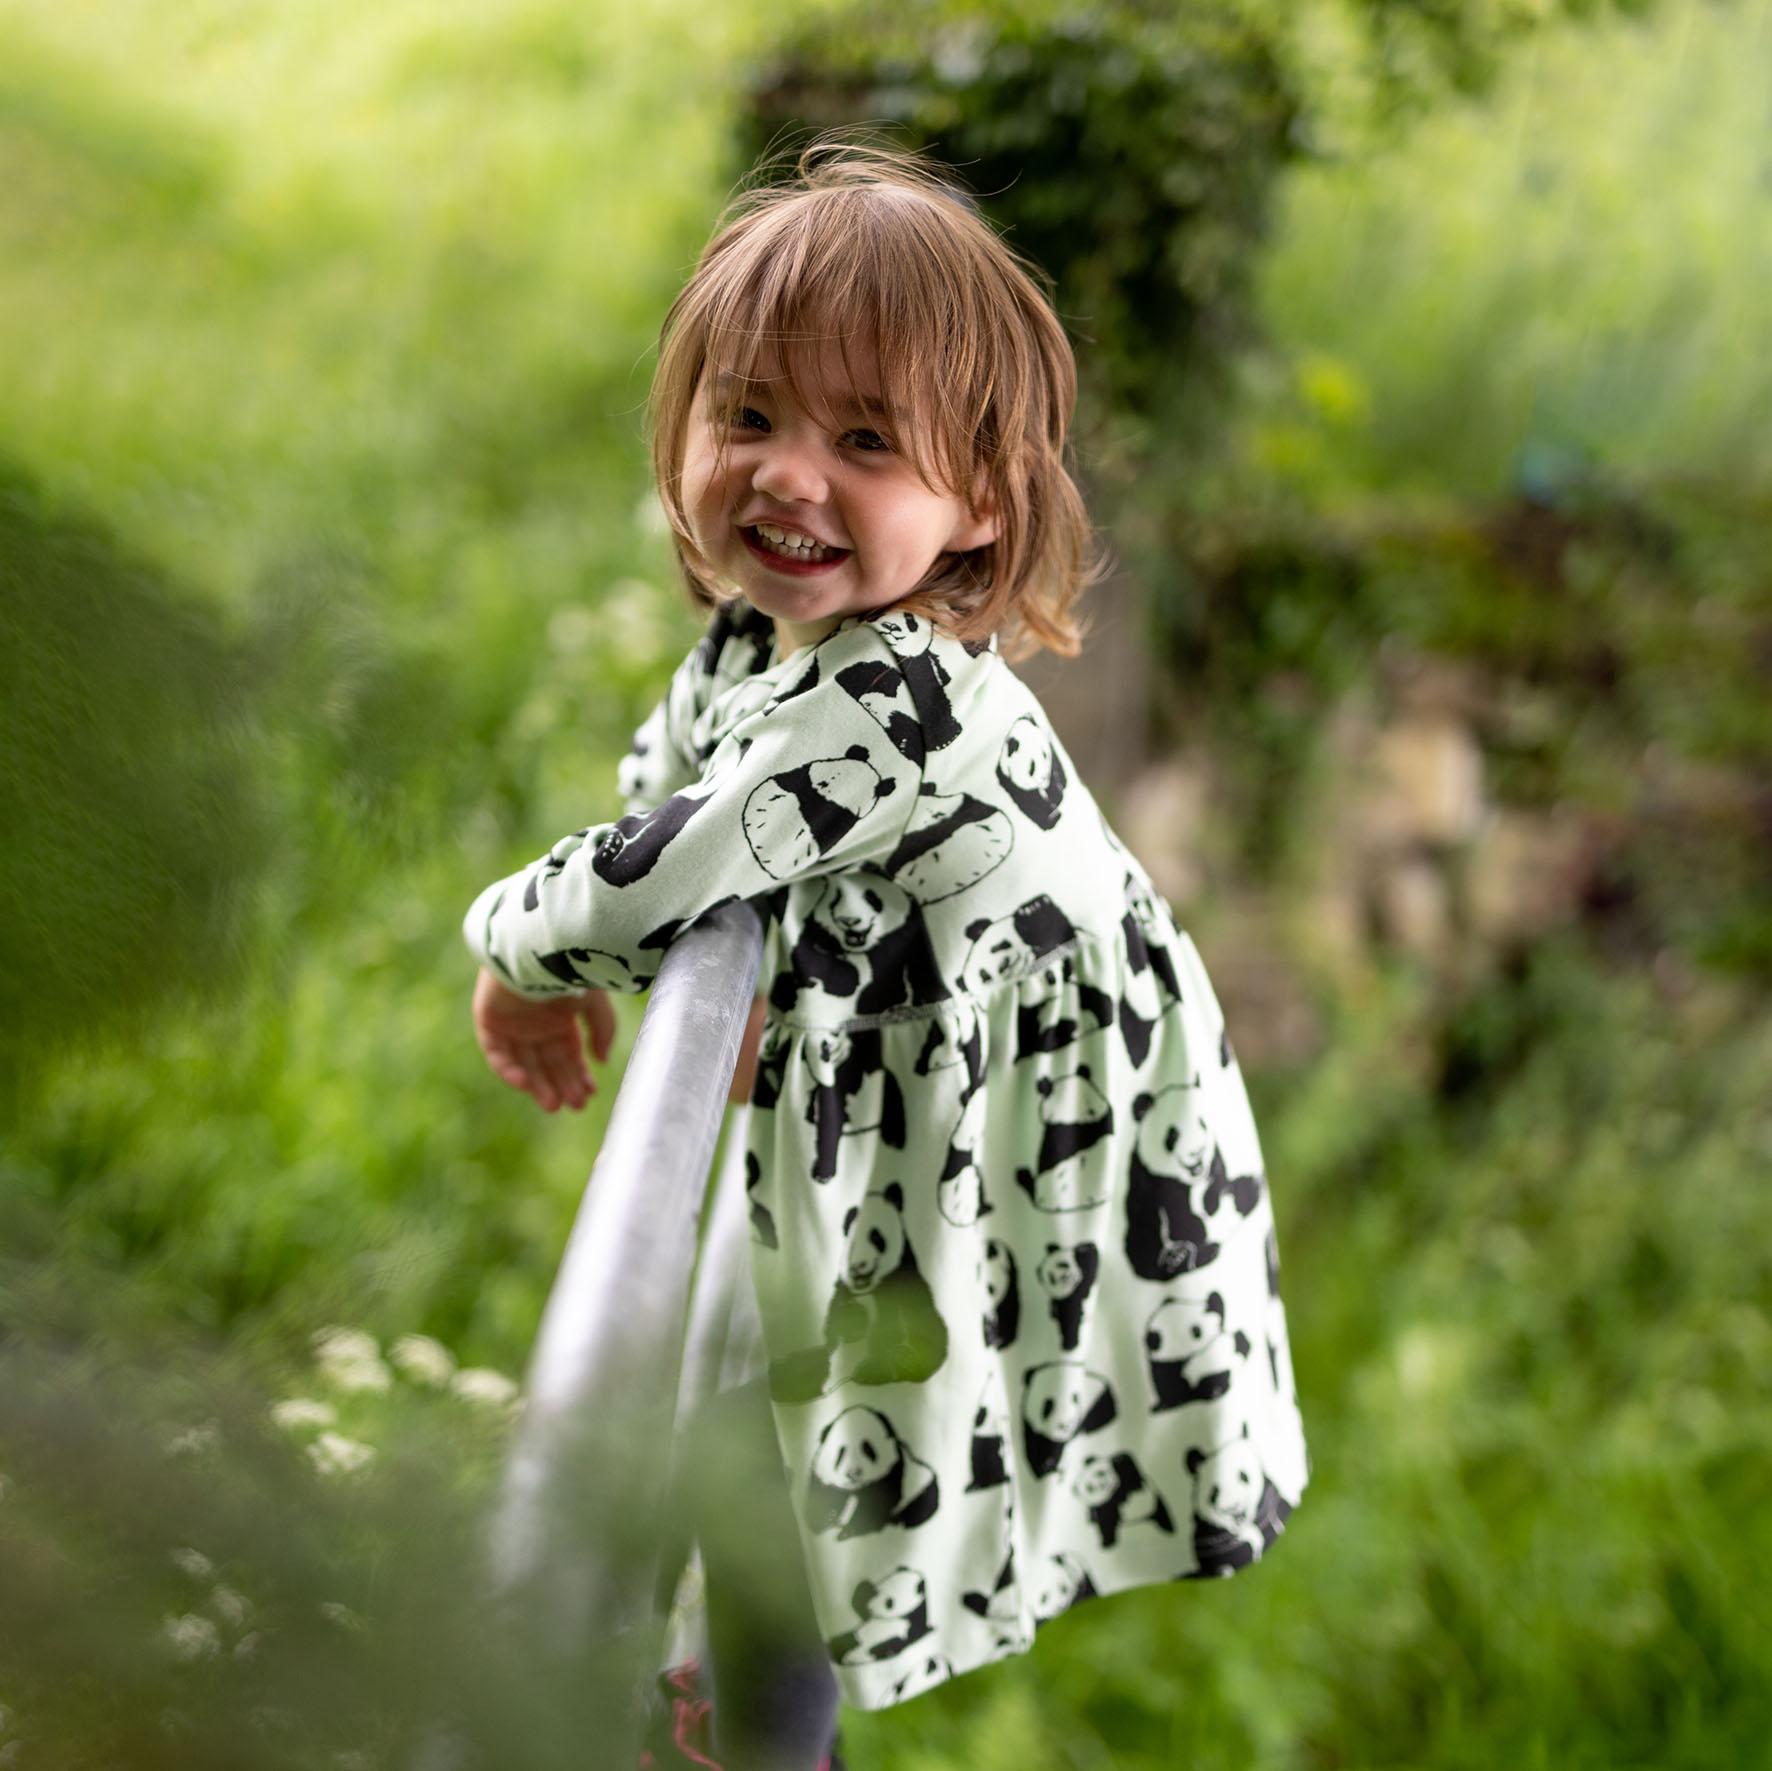 Fauna Kids Panda Dress 1 By Ausra Dooley Photography